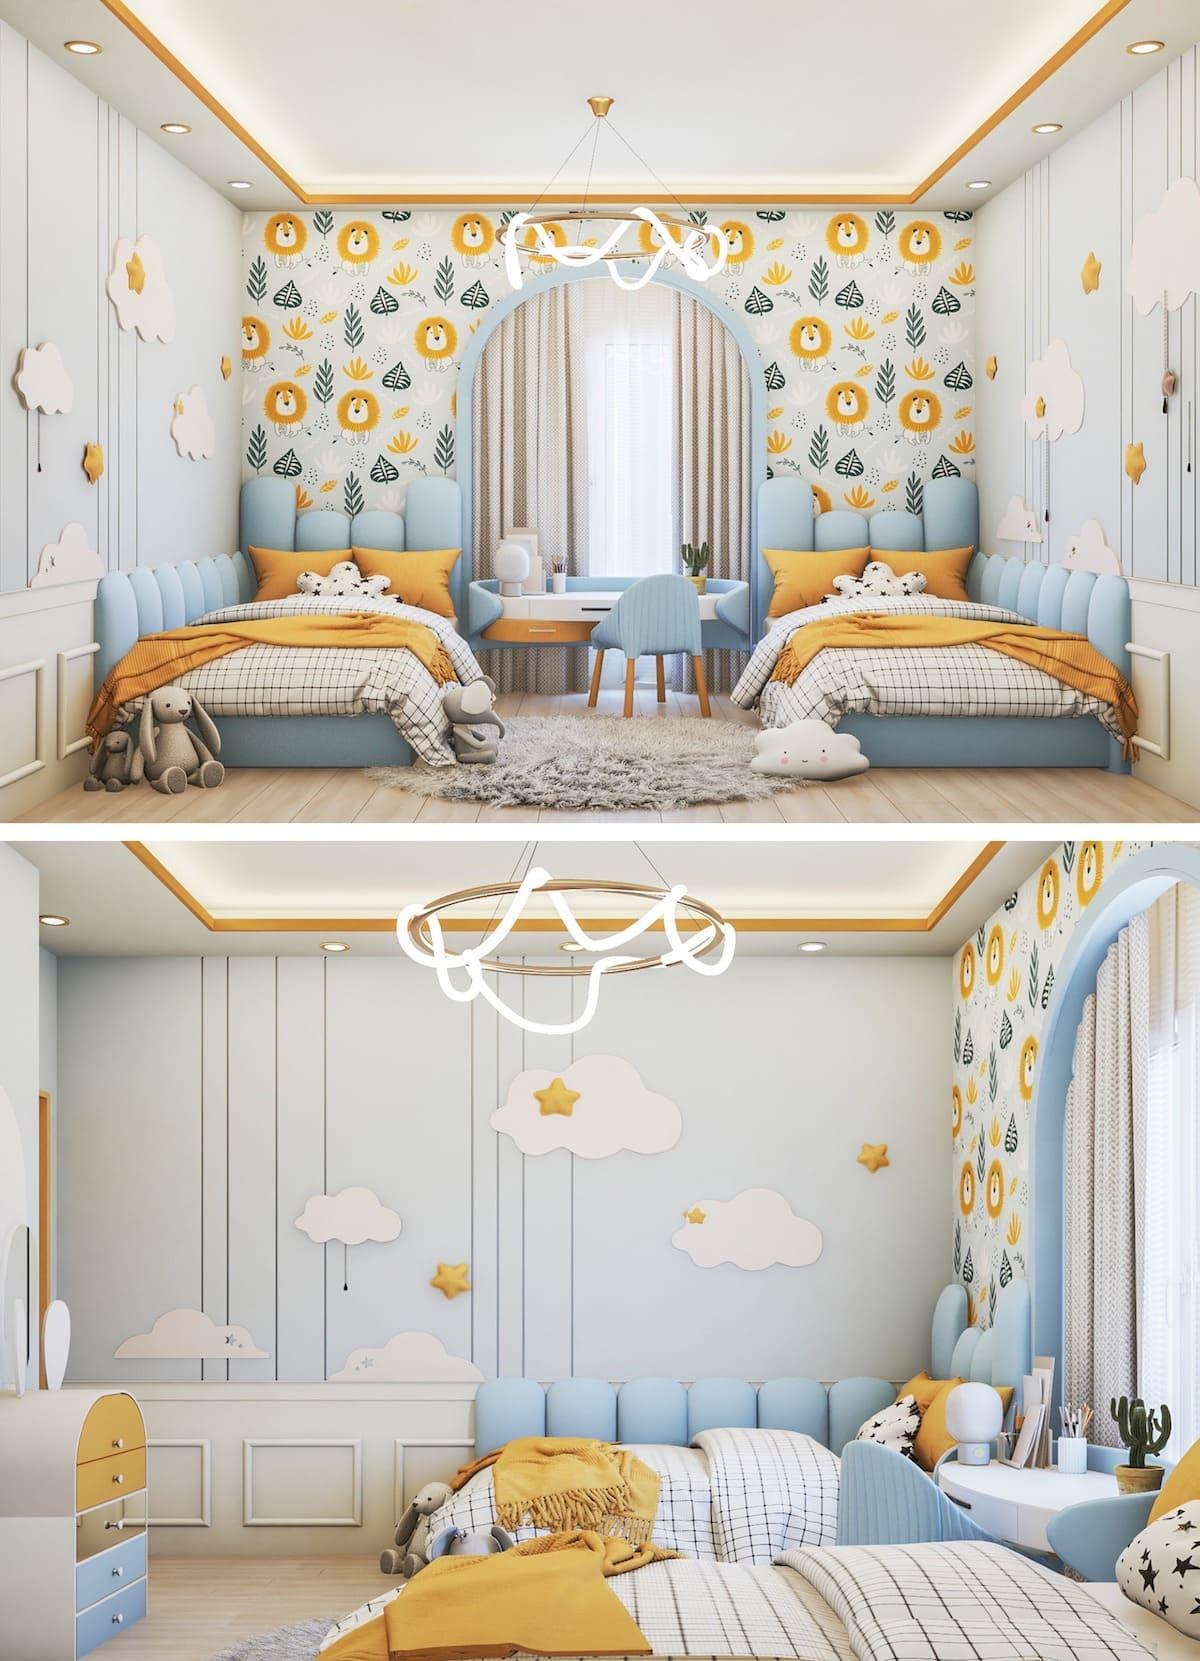 интерьер детской комнаты фото 54